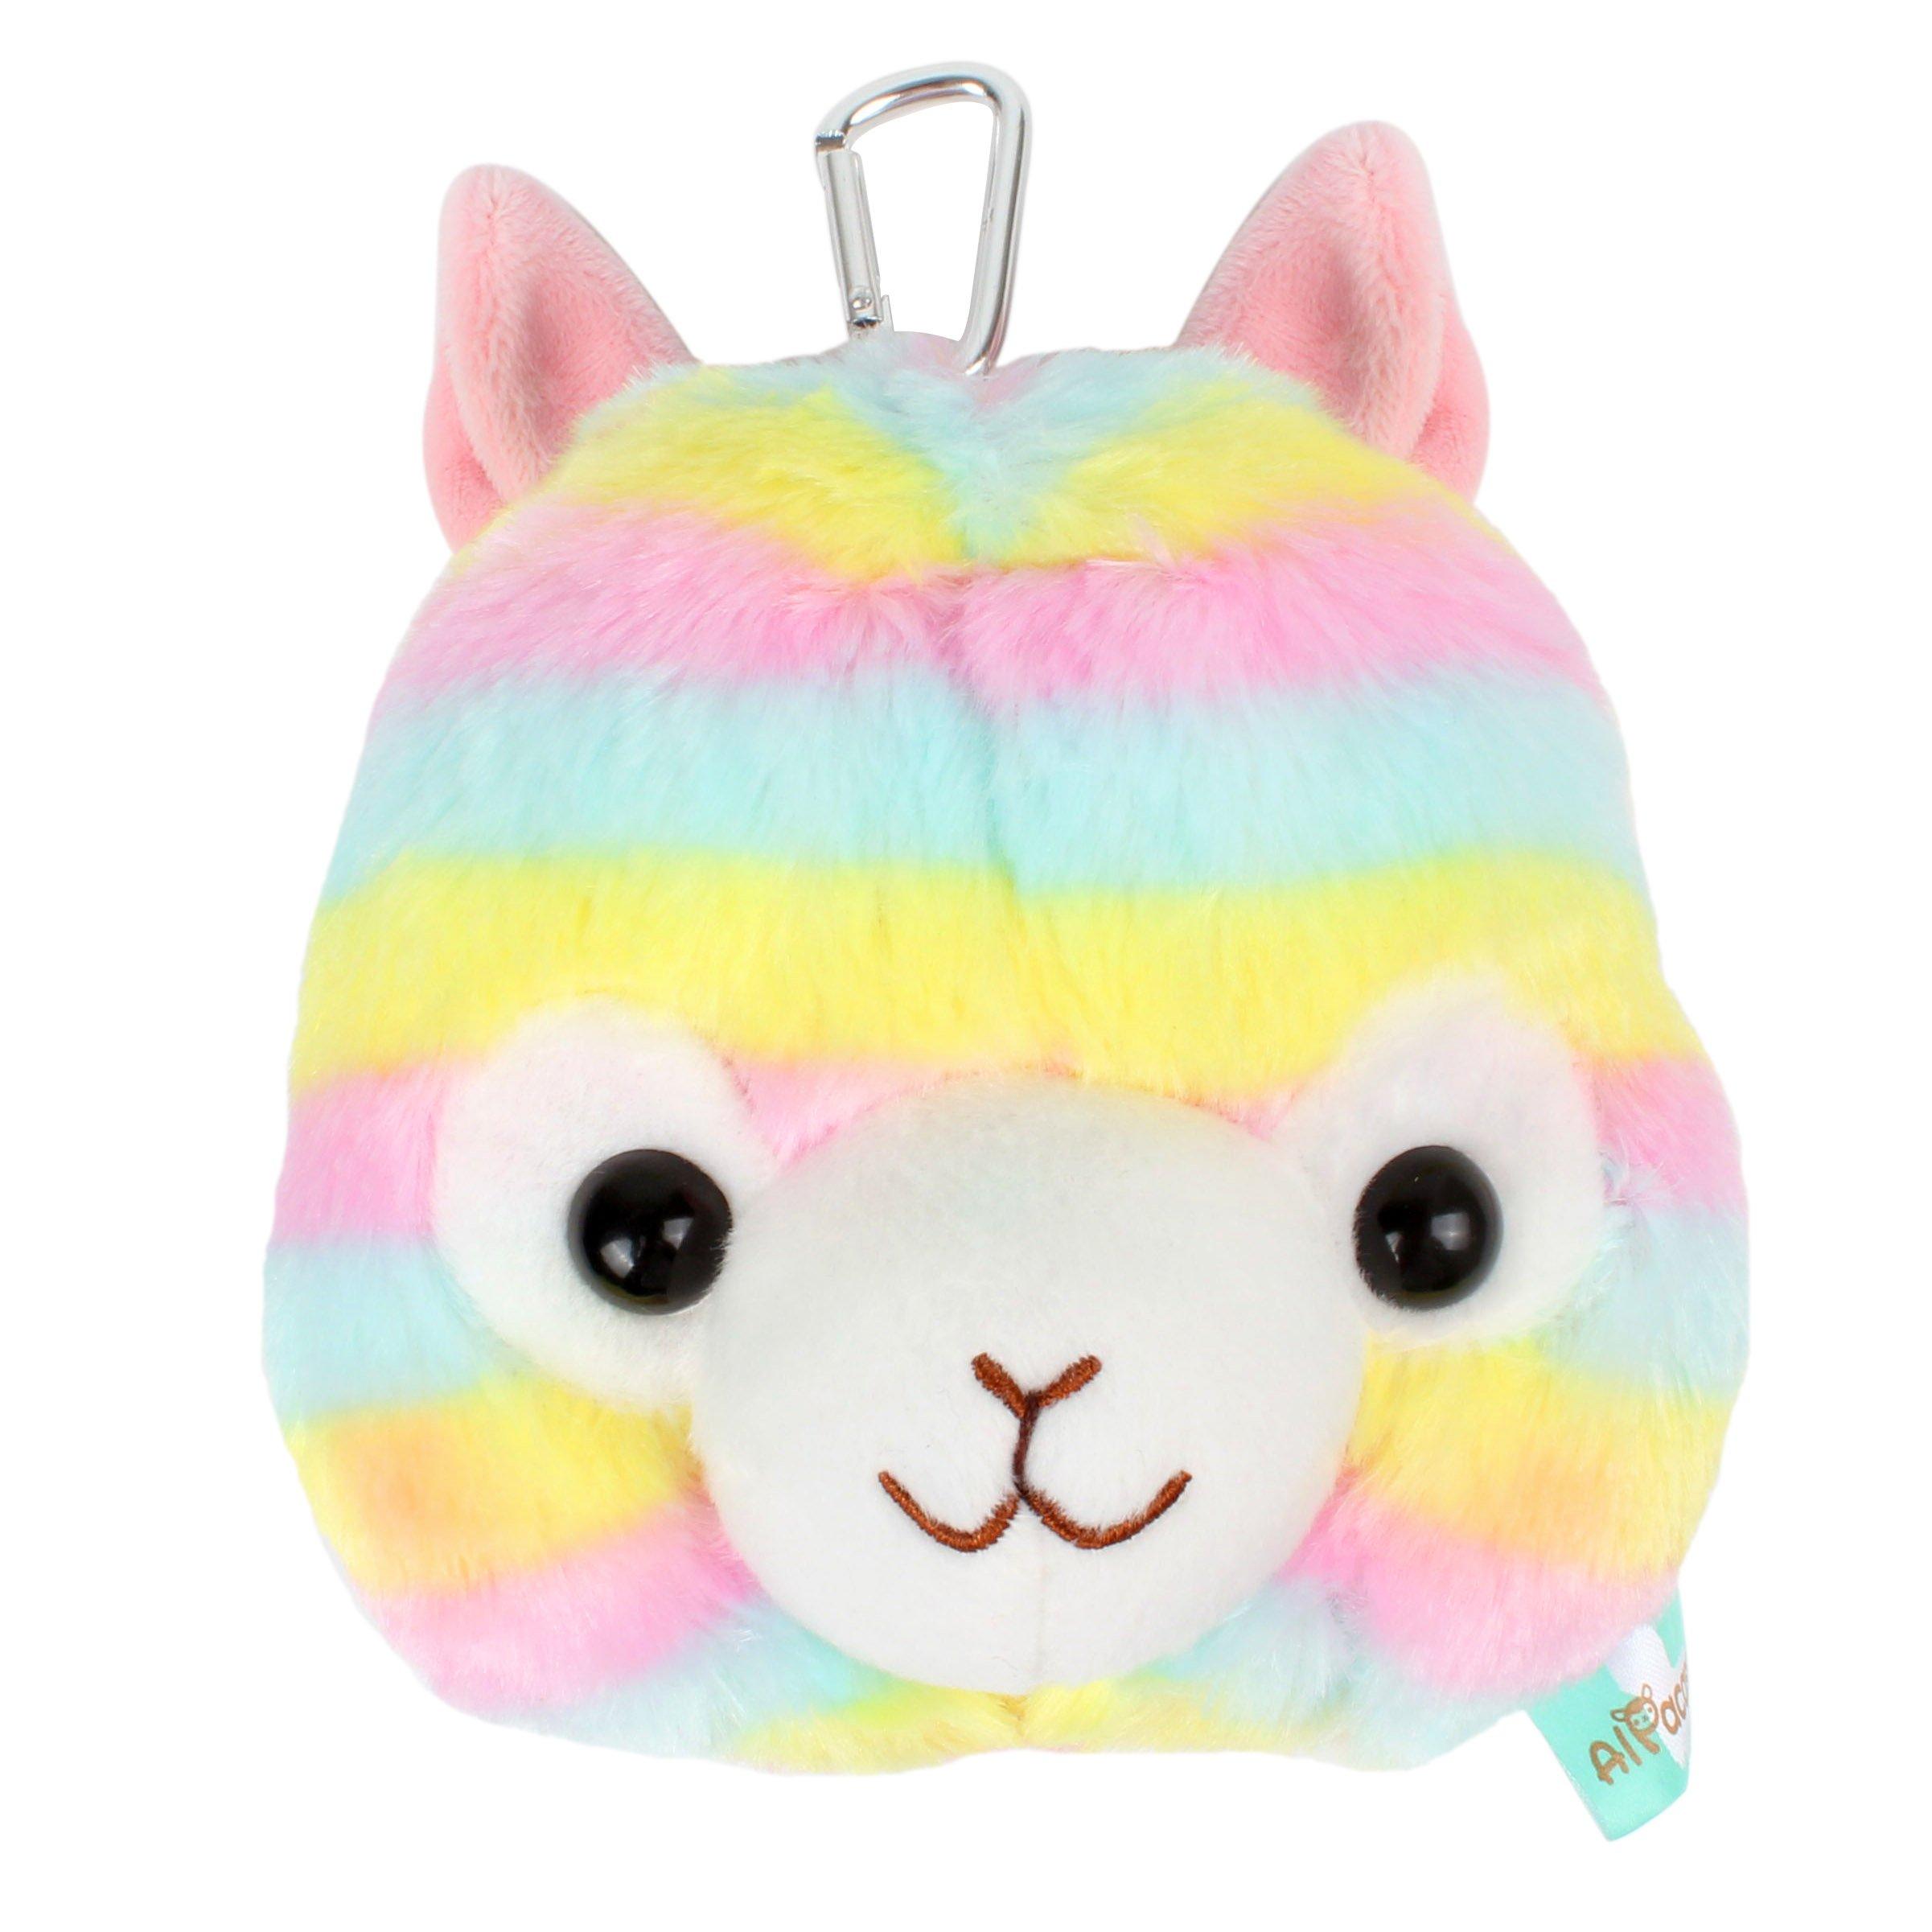 Kosbon 5.5'' Plush Rainbow Alpaca Carrying Coin Purse, Cute Soft Stuffed Animals Card Bag. (Rainbow Coin Purse)